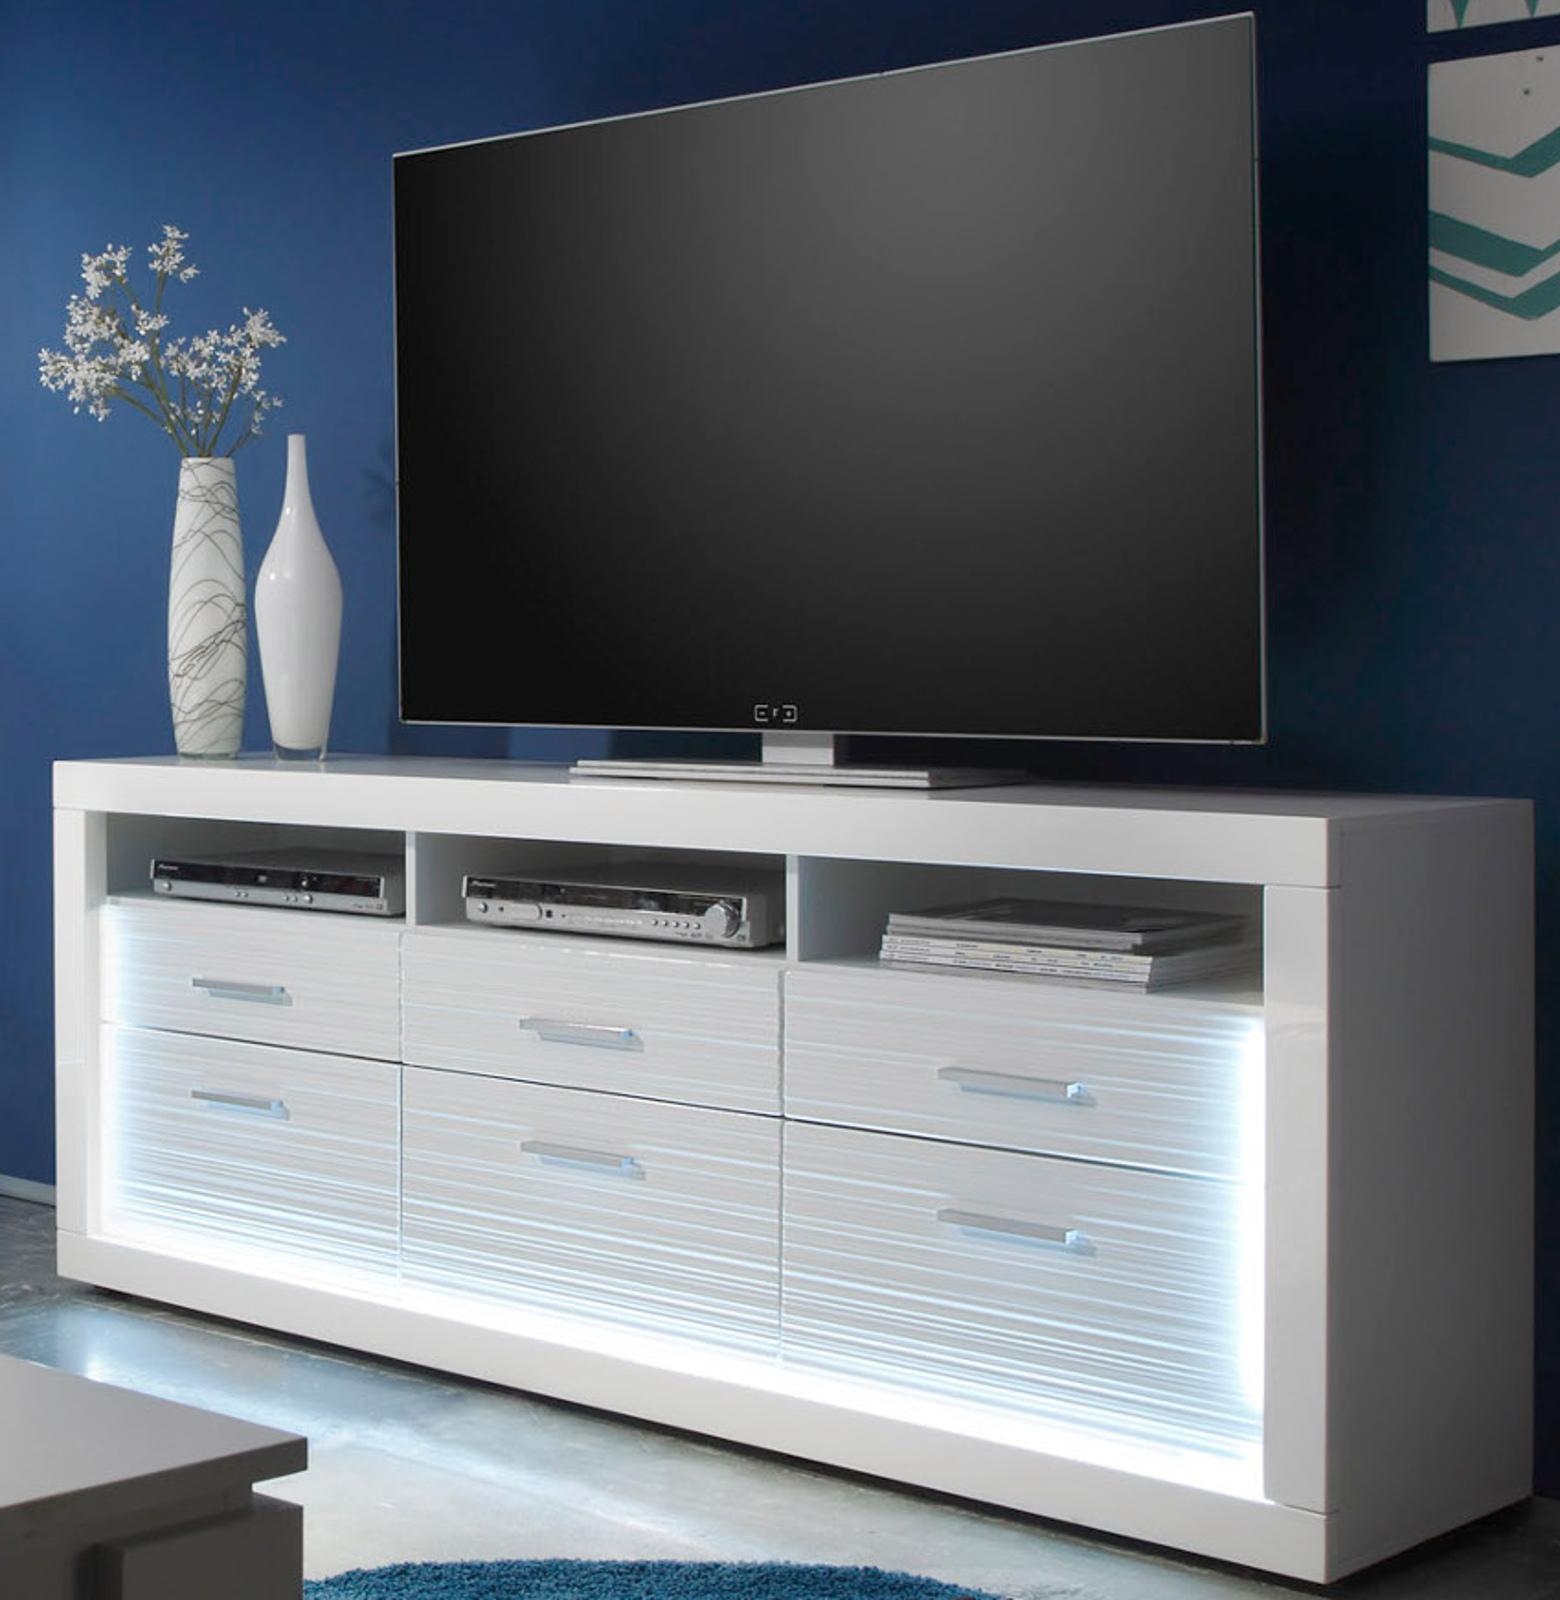 Tv lowboard led  TV Unterteil weiß Hochglanz Rillenoptik mit LED